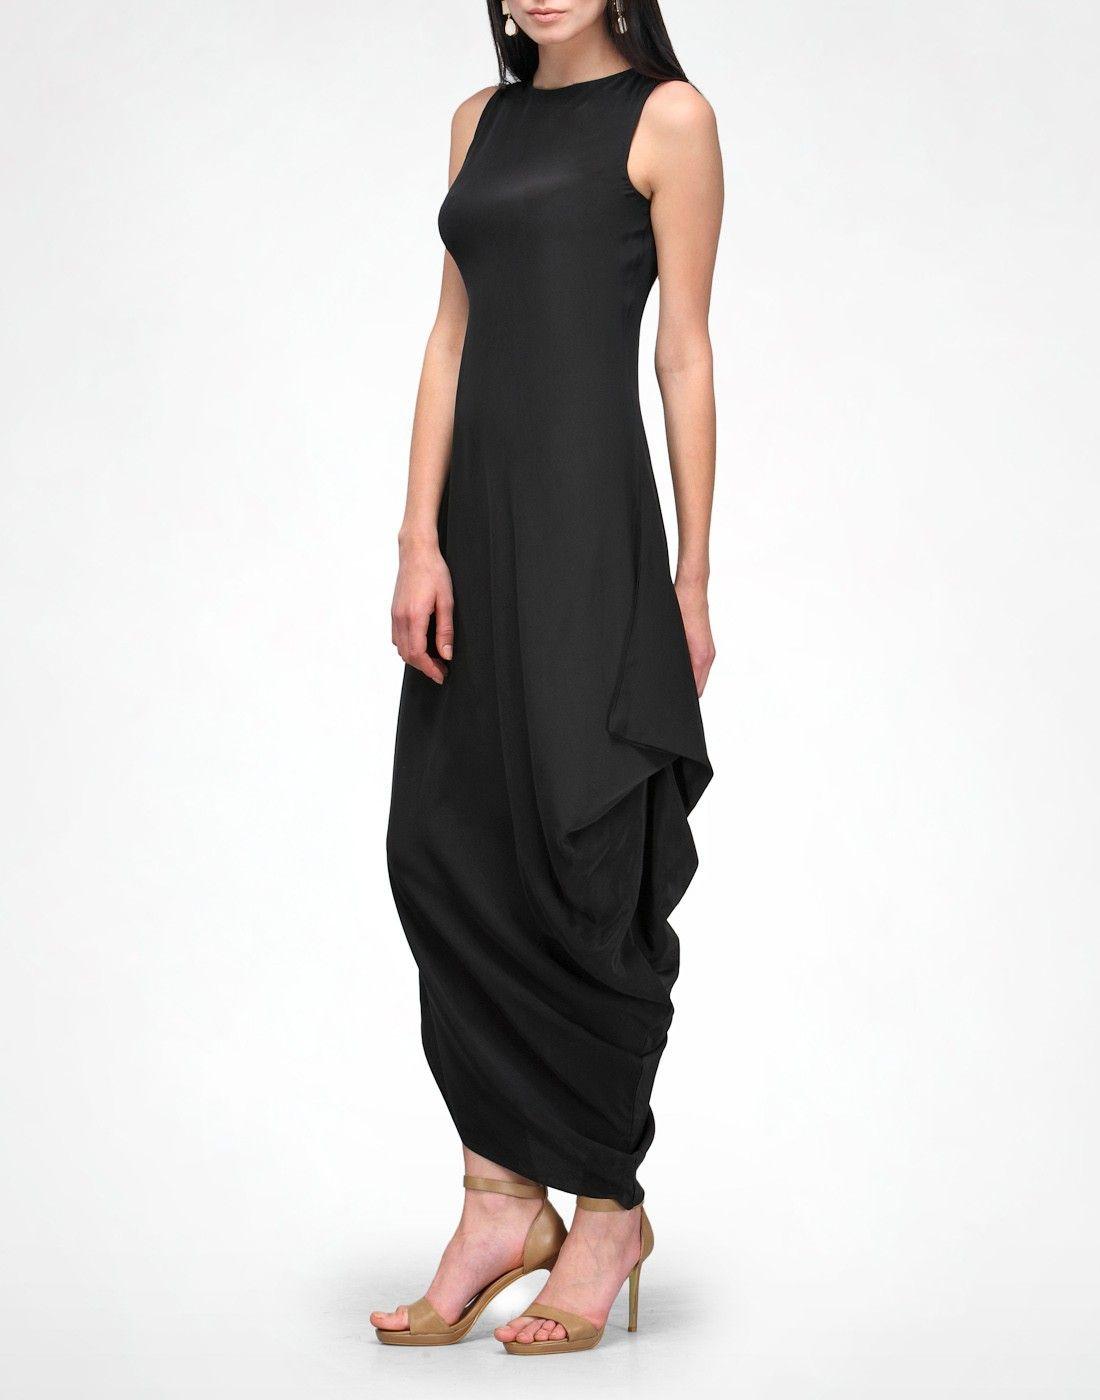 KAVITA BHARTIA Black Side Drape Dress $182 silk crepe 100% silk ... for Drapes Clothes  146hul